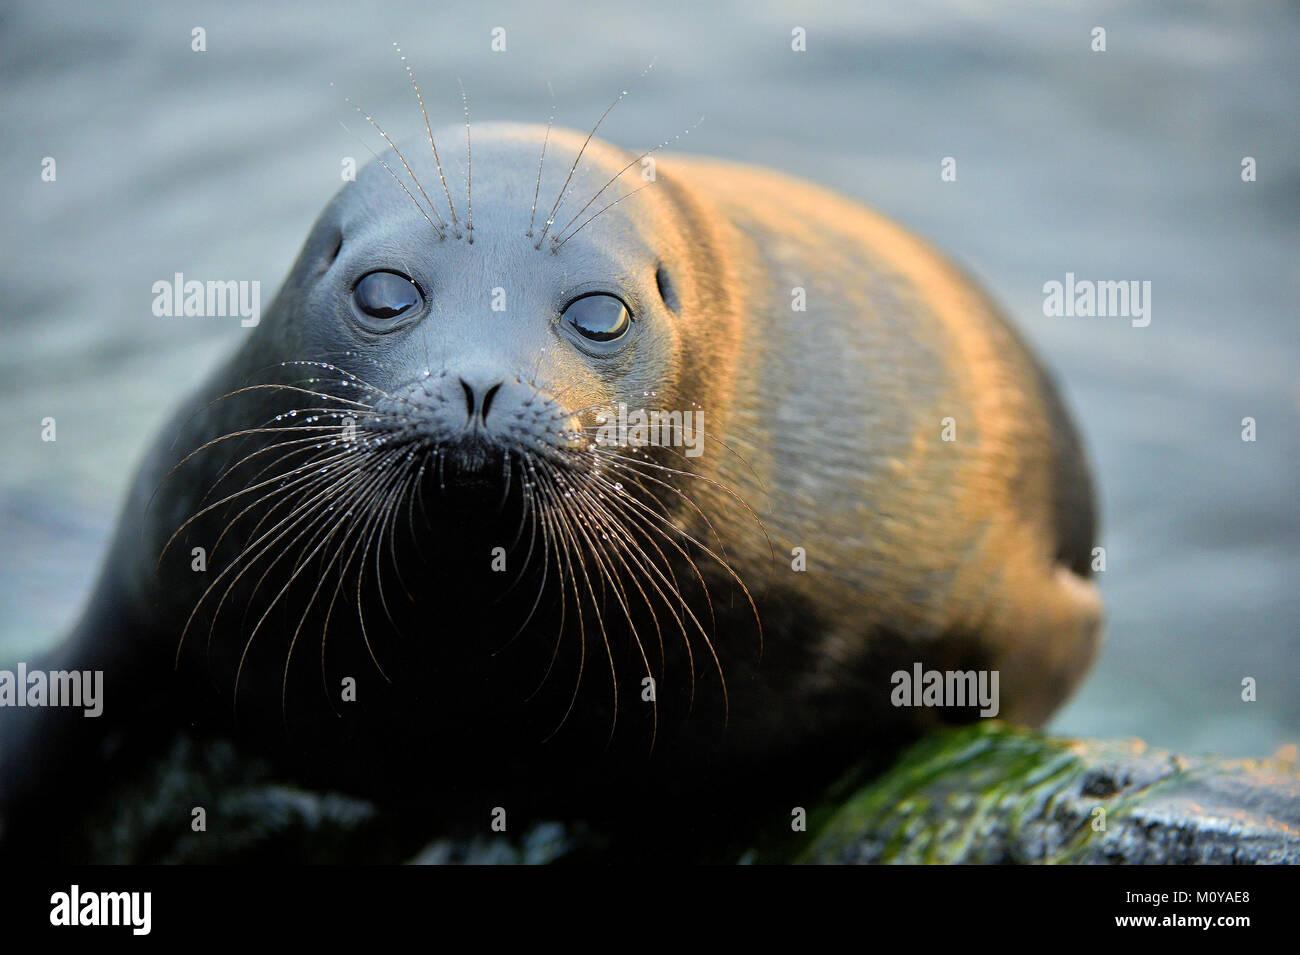 The Ladoga ringed seal ( Pusa hispida ladogensis) close up. The Ladoga seal in a native habitat - Stock Image